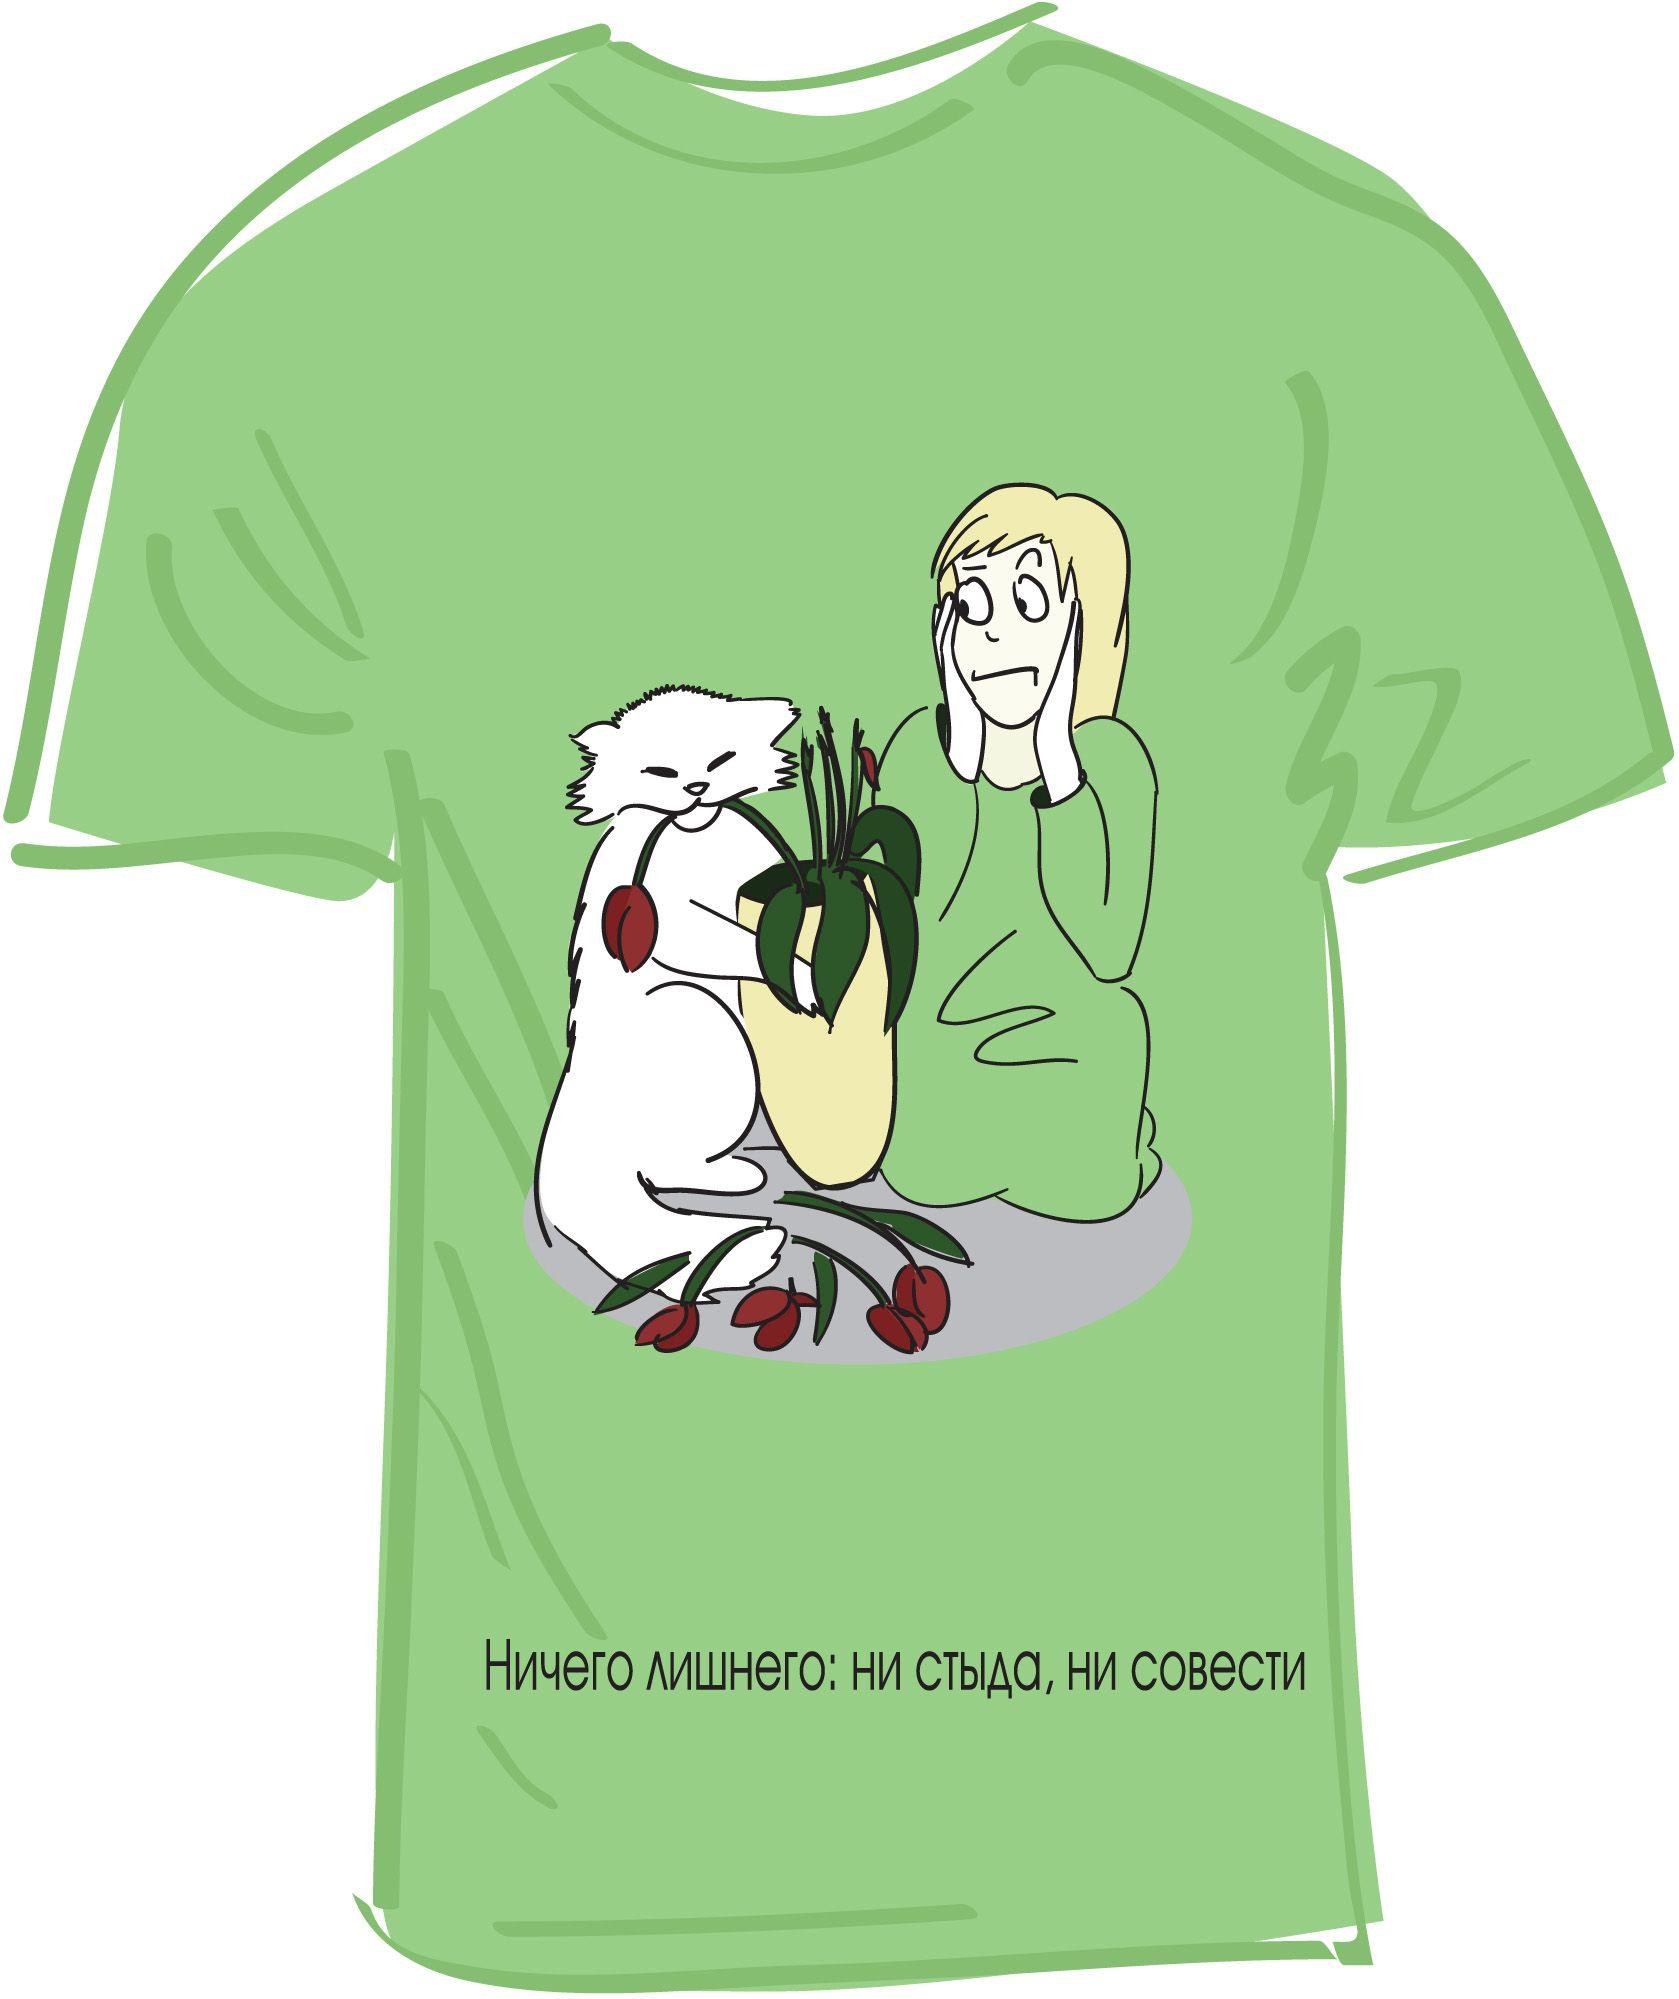 Принт к фразе на мужскую футболку - дизайнер katavoronchihin